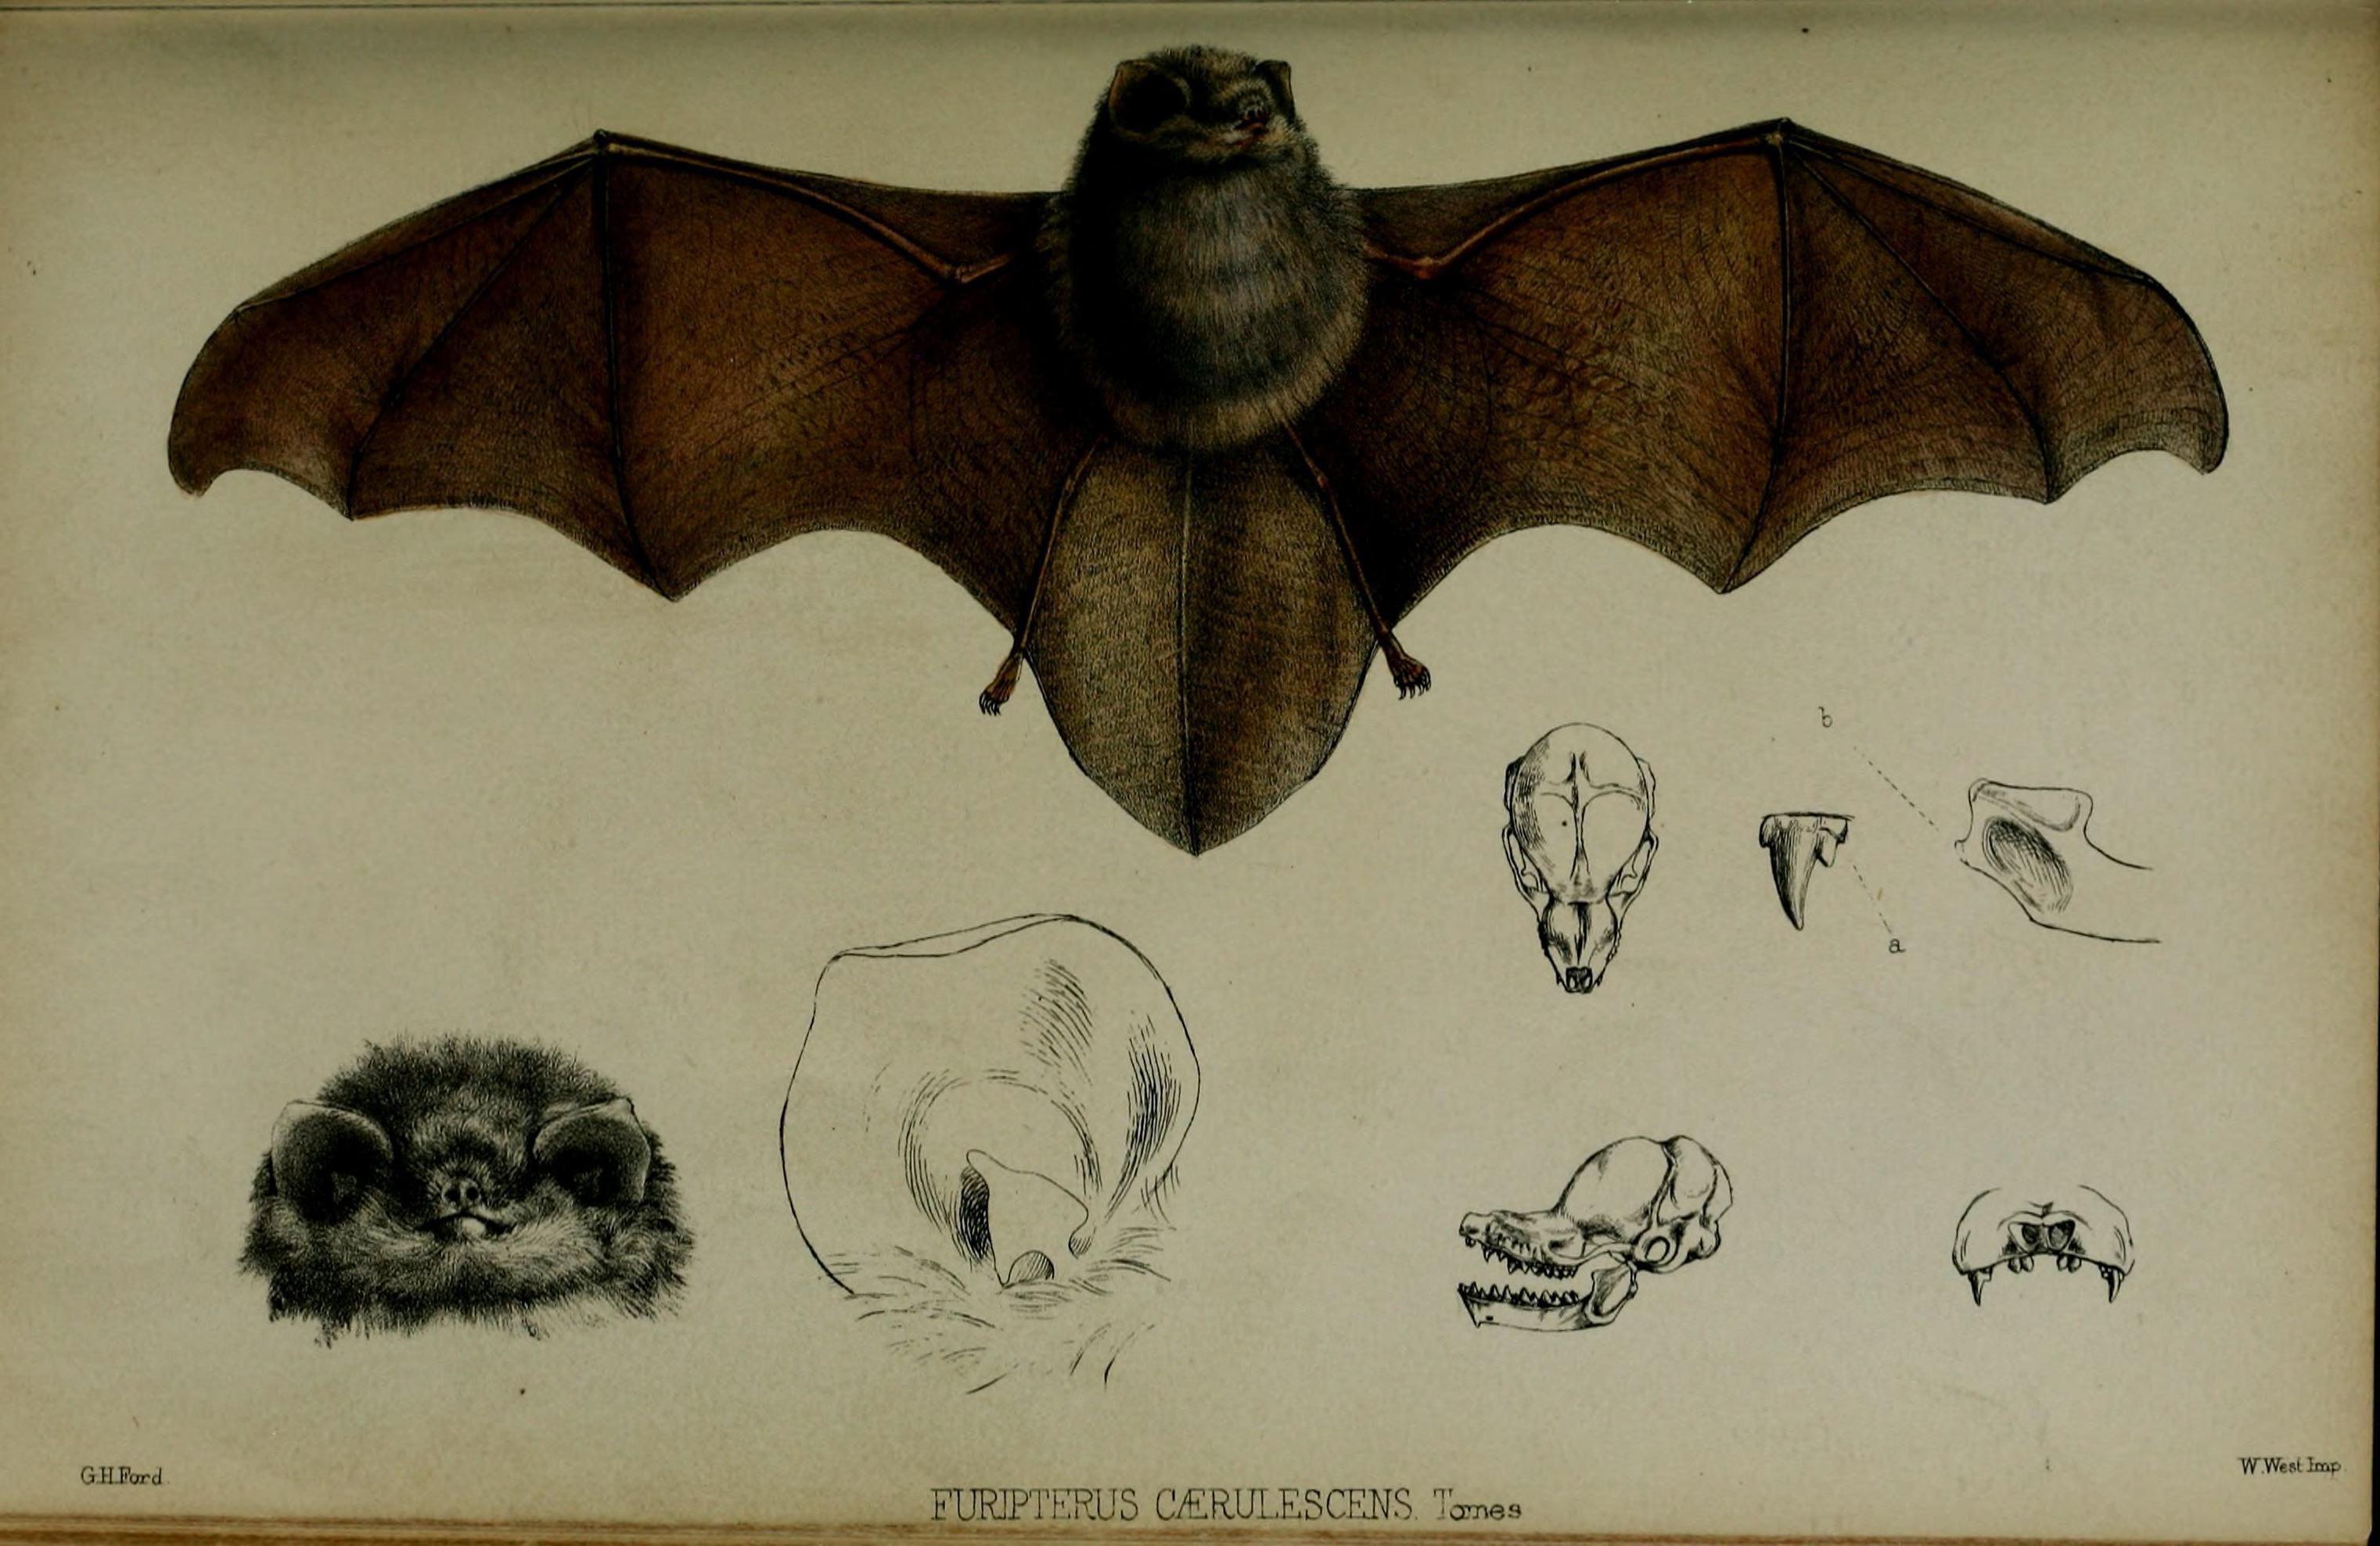 Image of smoky bats and thumbless bats